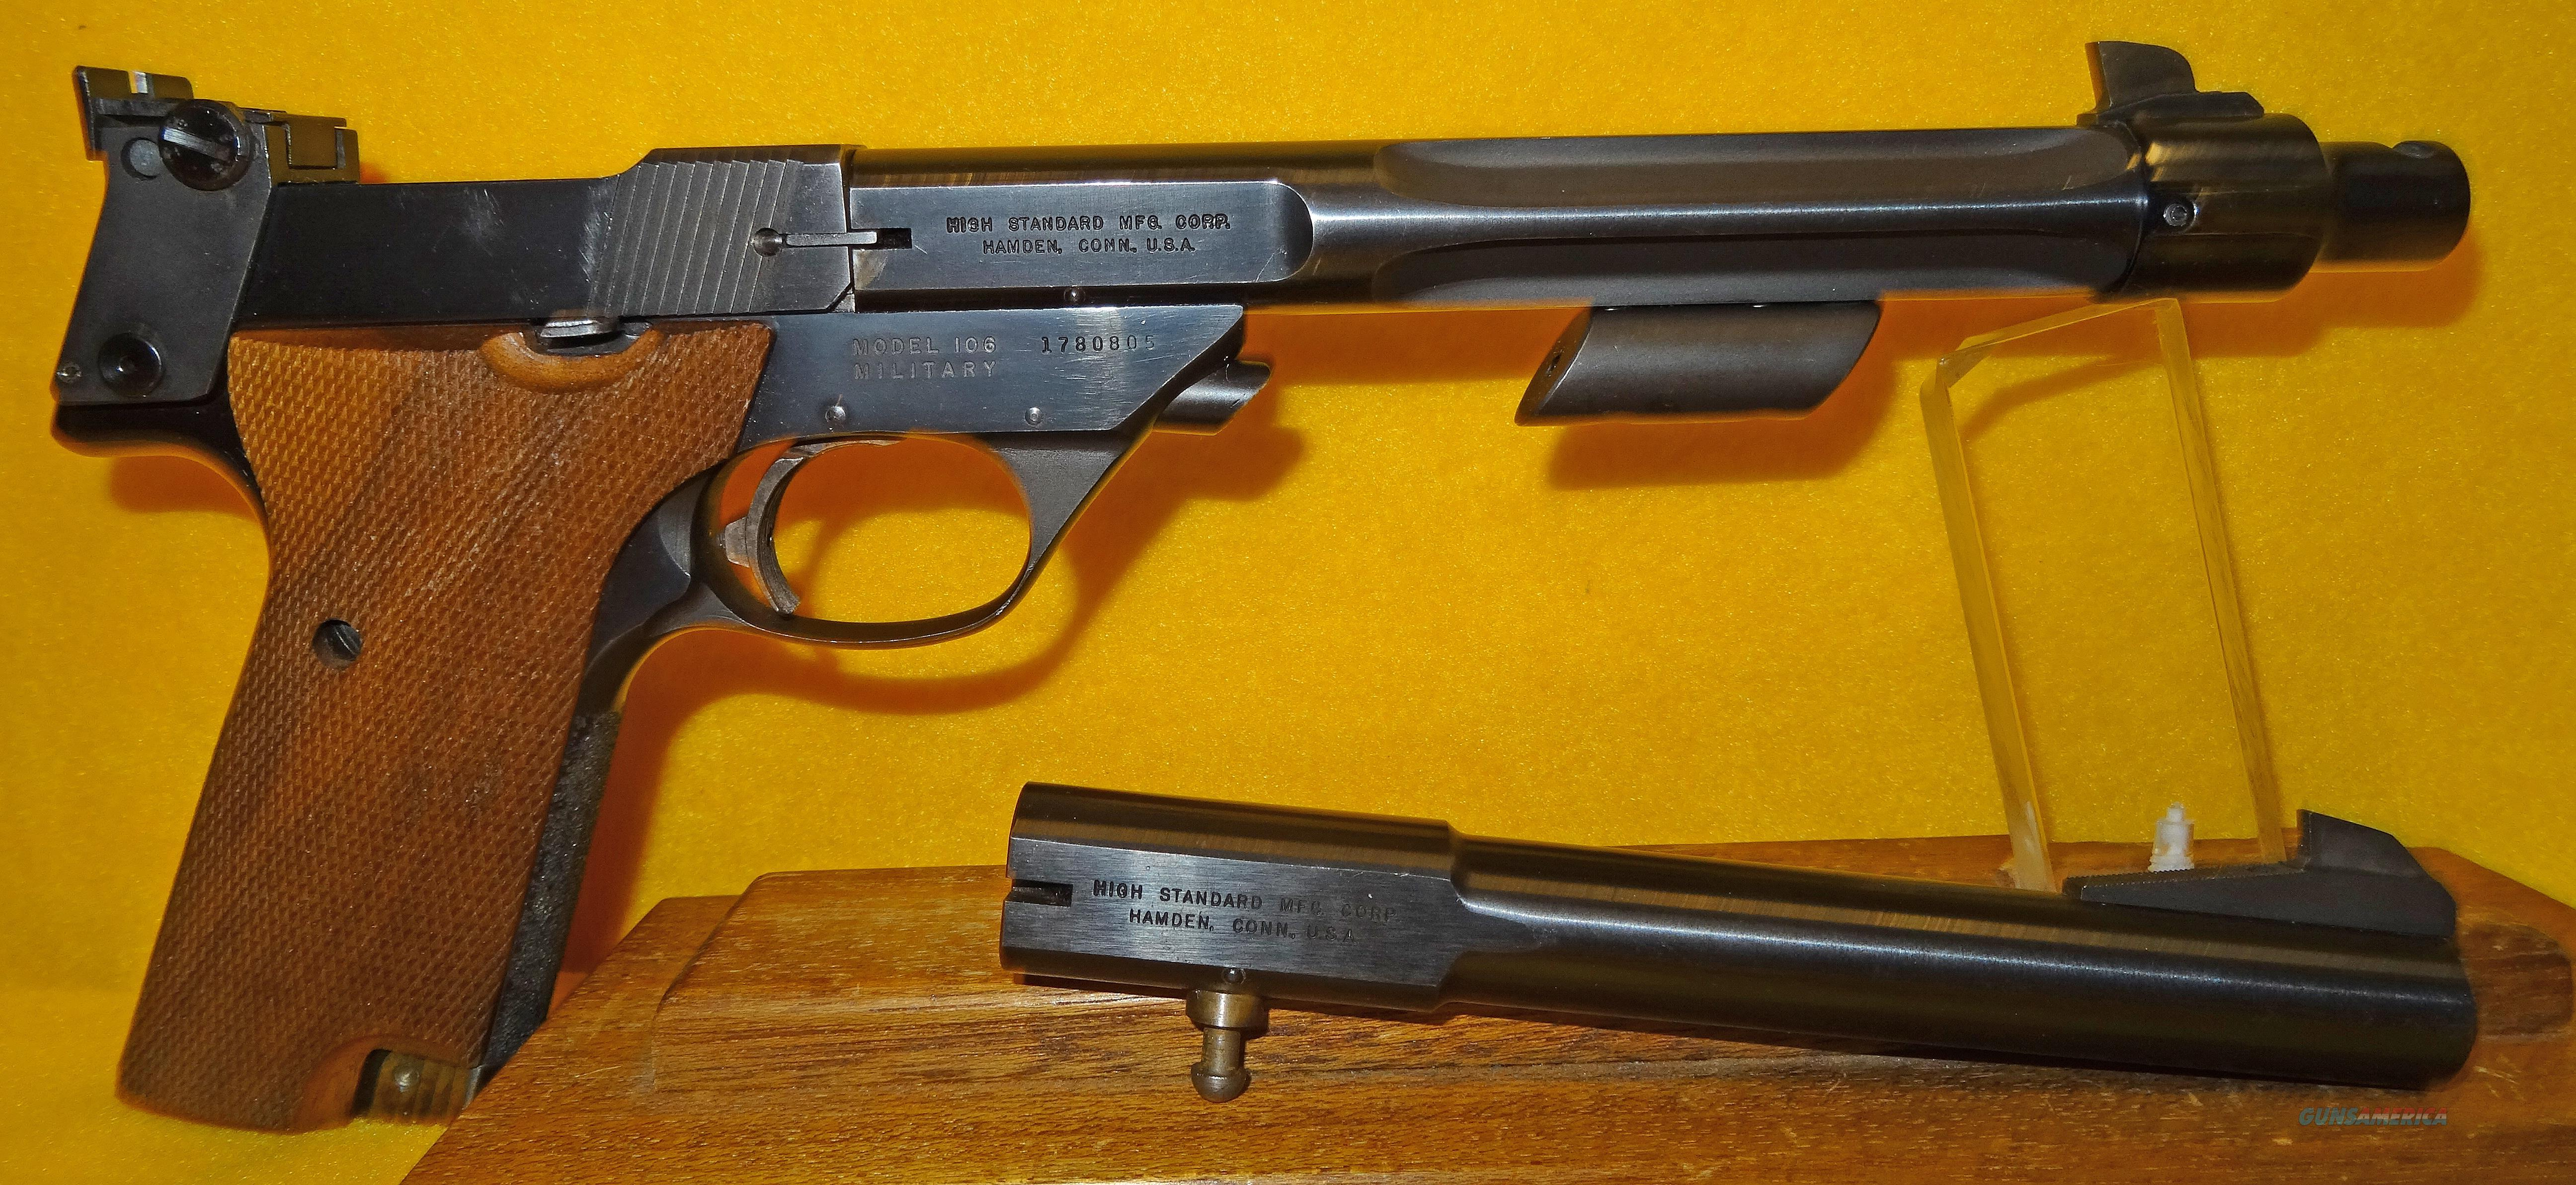 HI-STANDARD SUPERMATIC CITATION MODEL 106 MILITARY  Guns > Pistols > High Standard Pistols